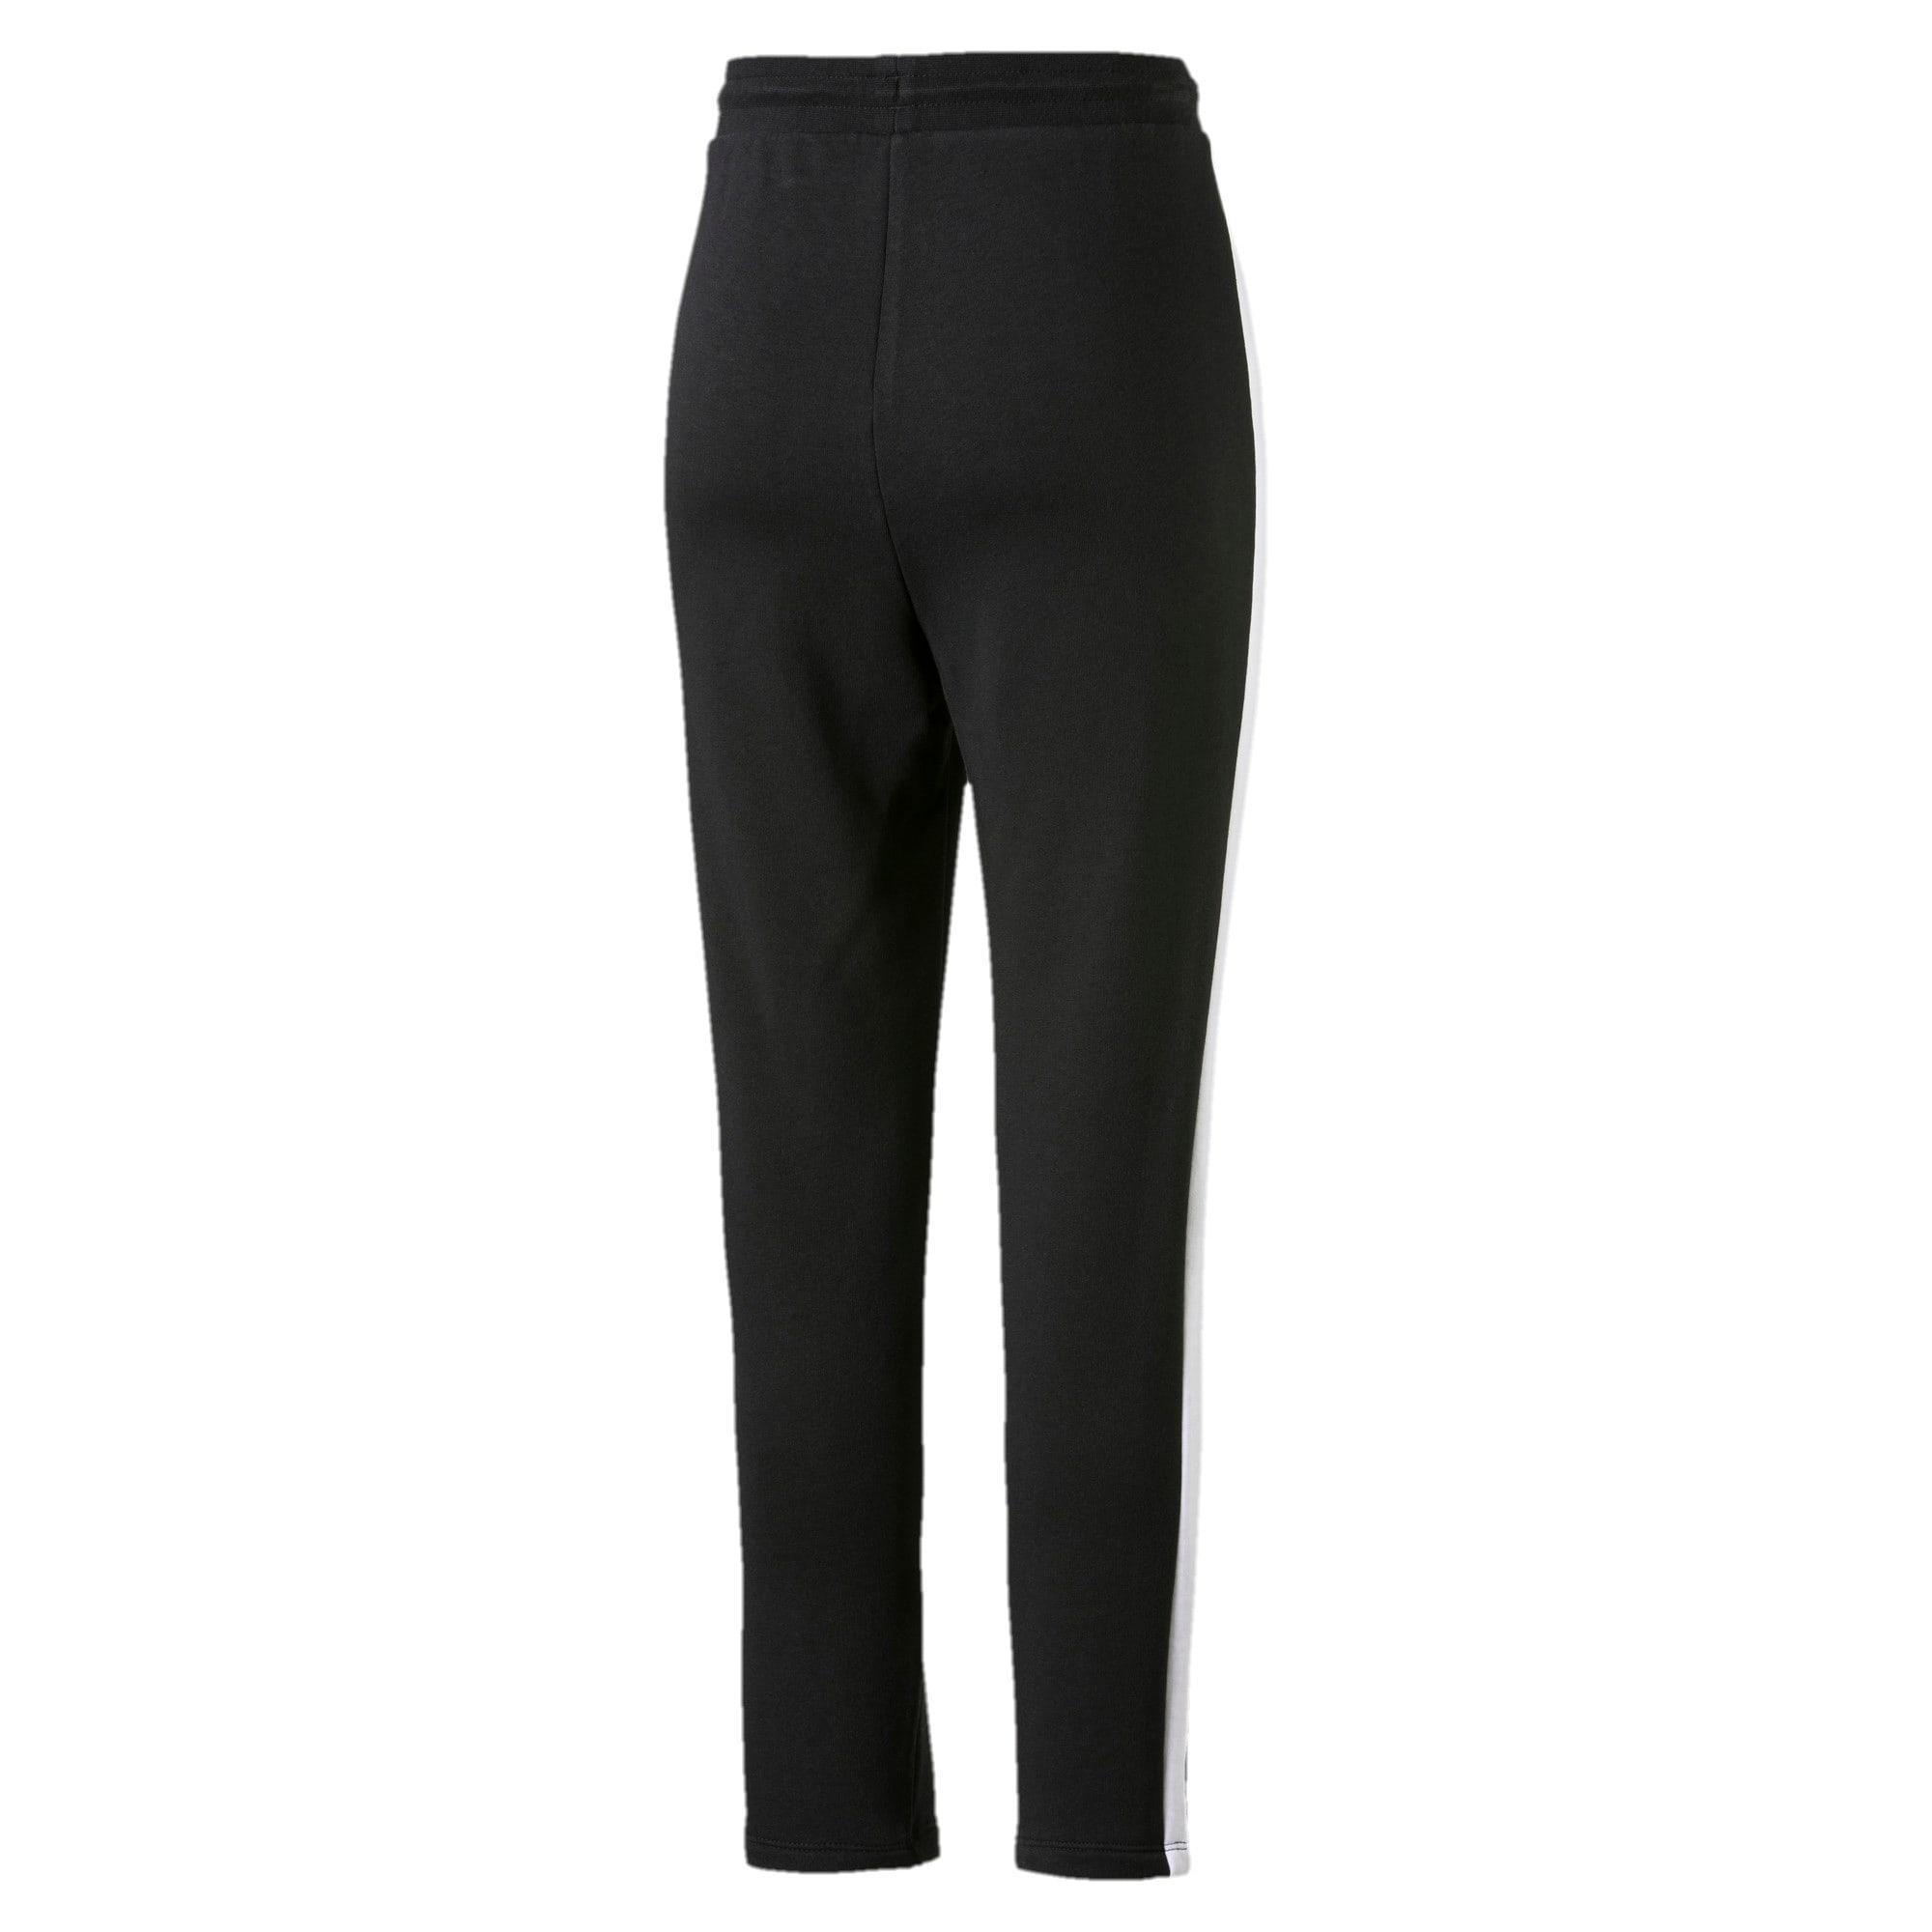 Miniatura 3 de Pantalones deportivos Classics T7 de felpa francesa para mujer, Cotton Black, mediano